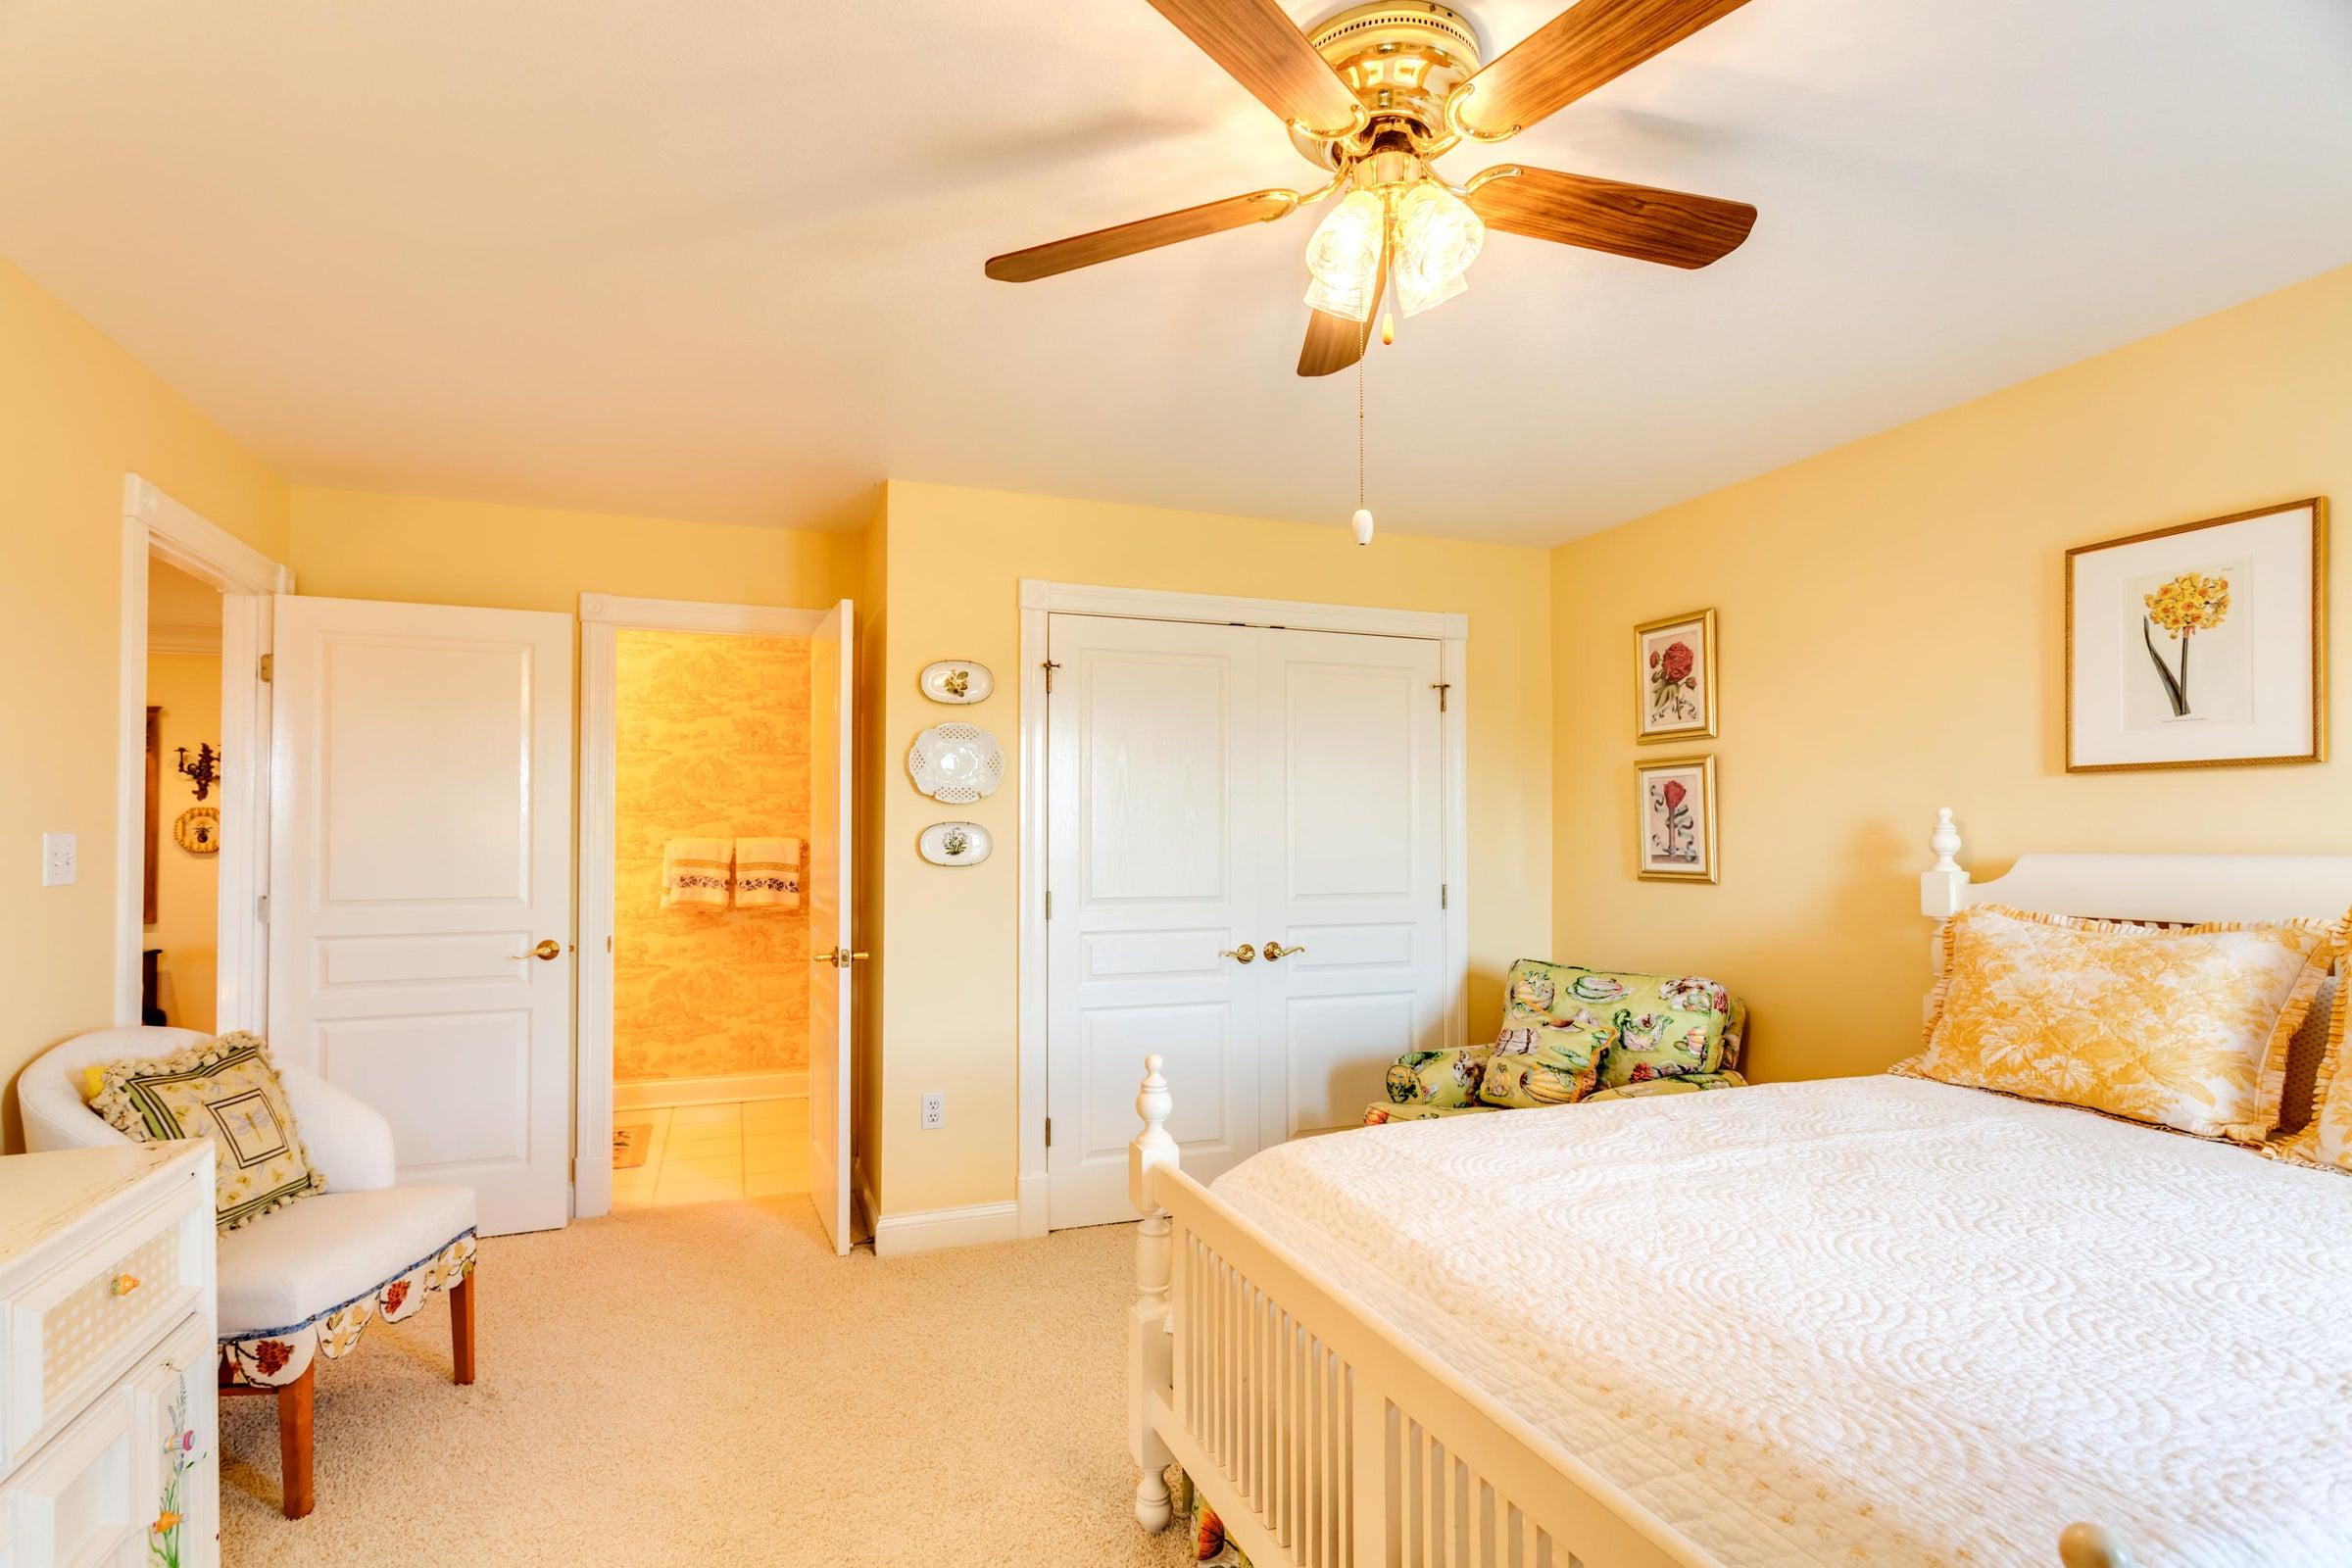 Bedroom 2 has a private bath